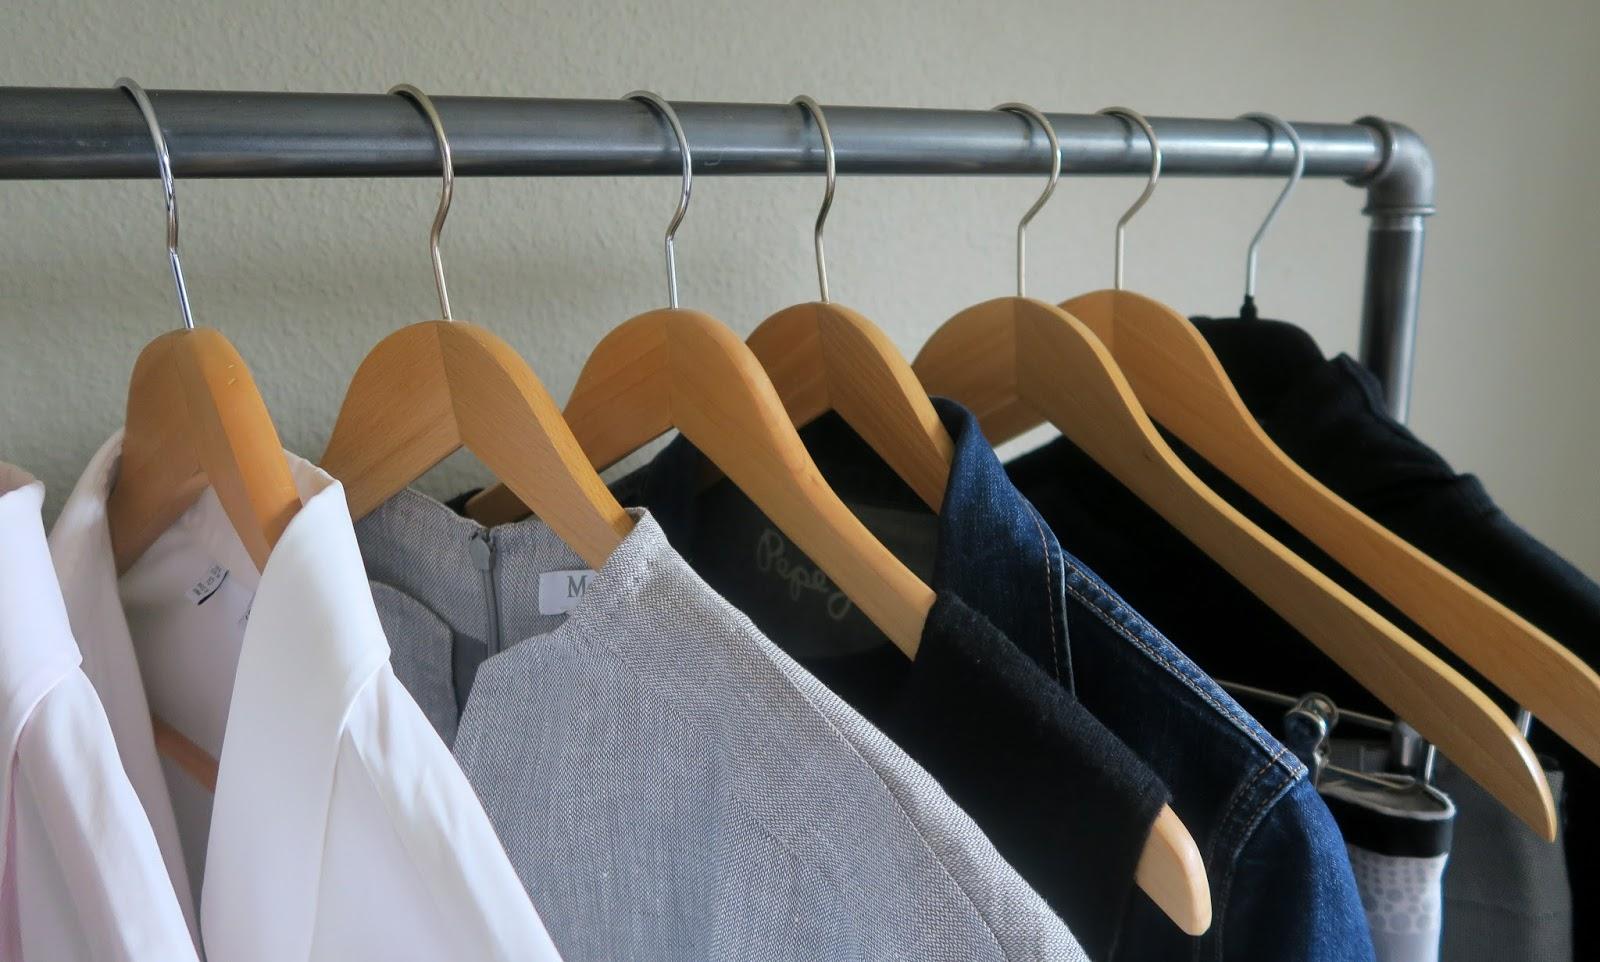 Wardrobe Organizer